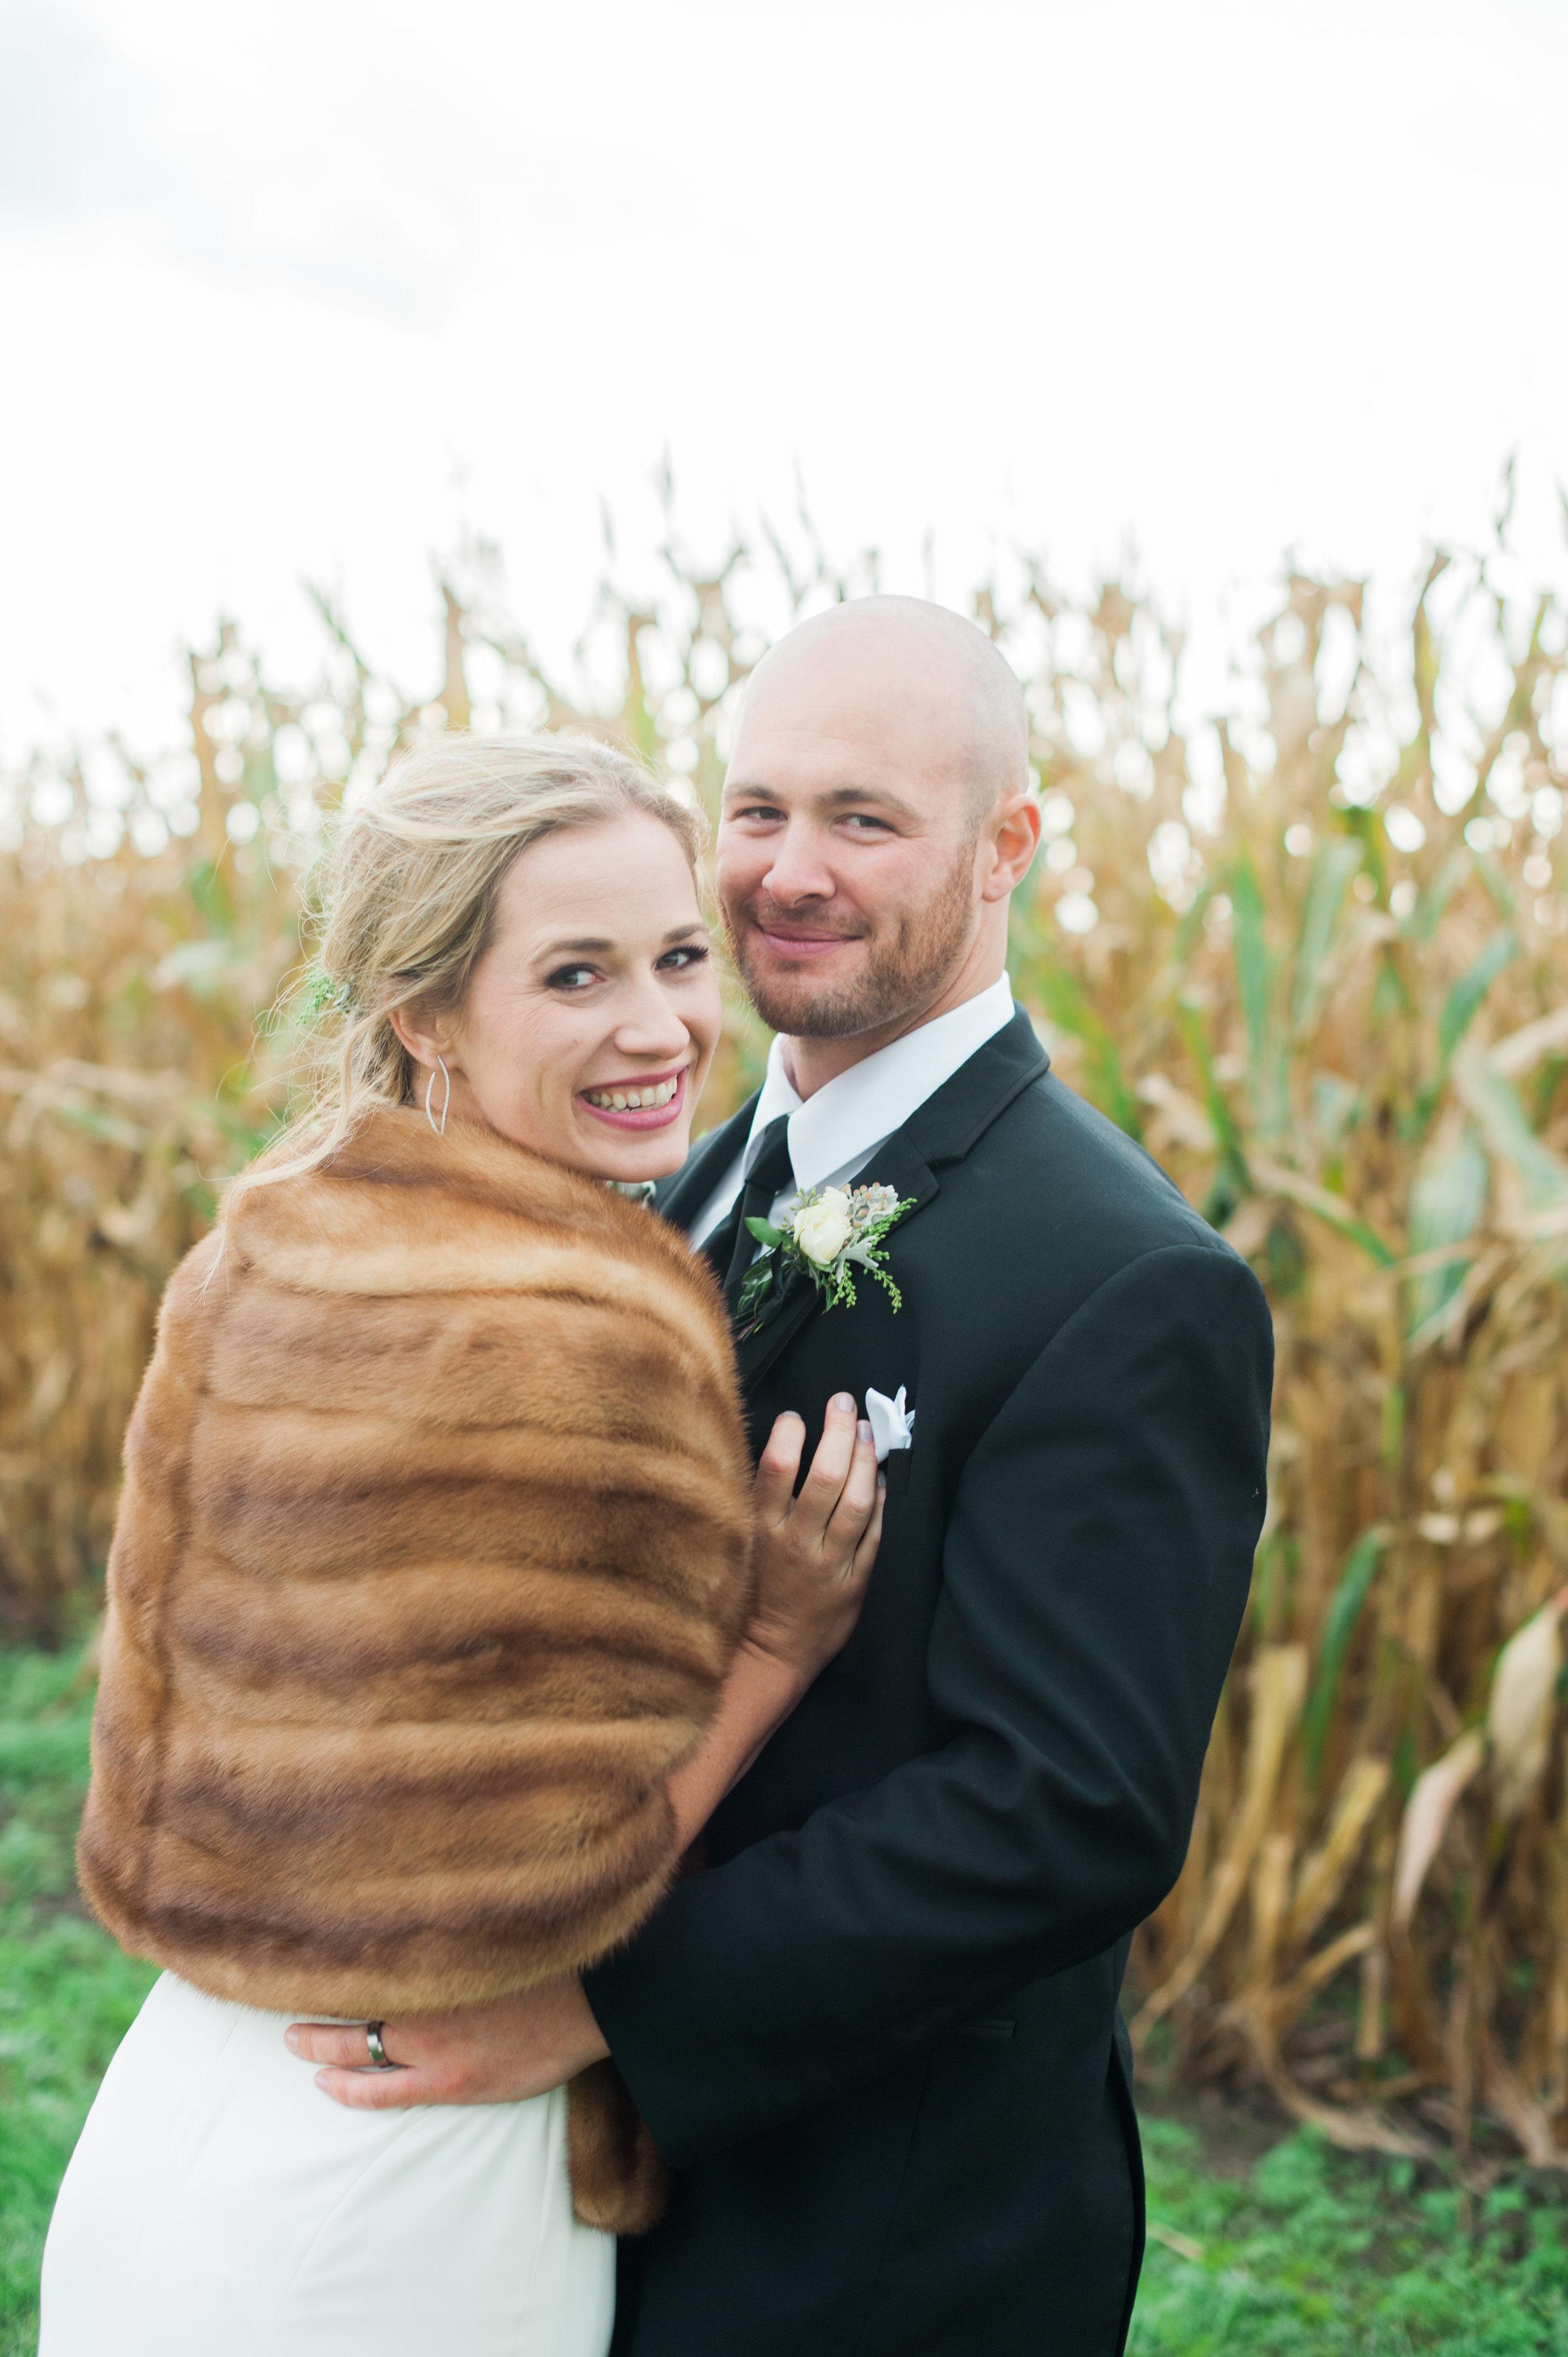 Aimee Alex-8 Wedding Party II-0075.jpg